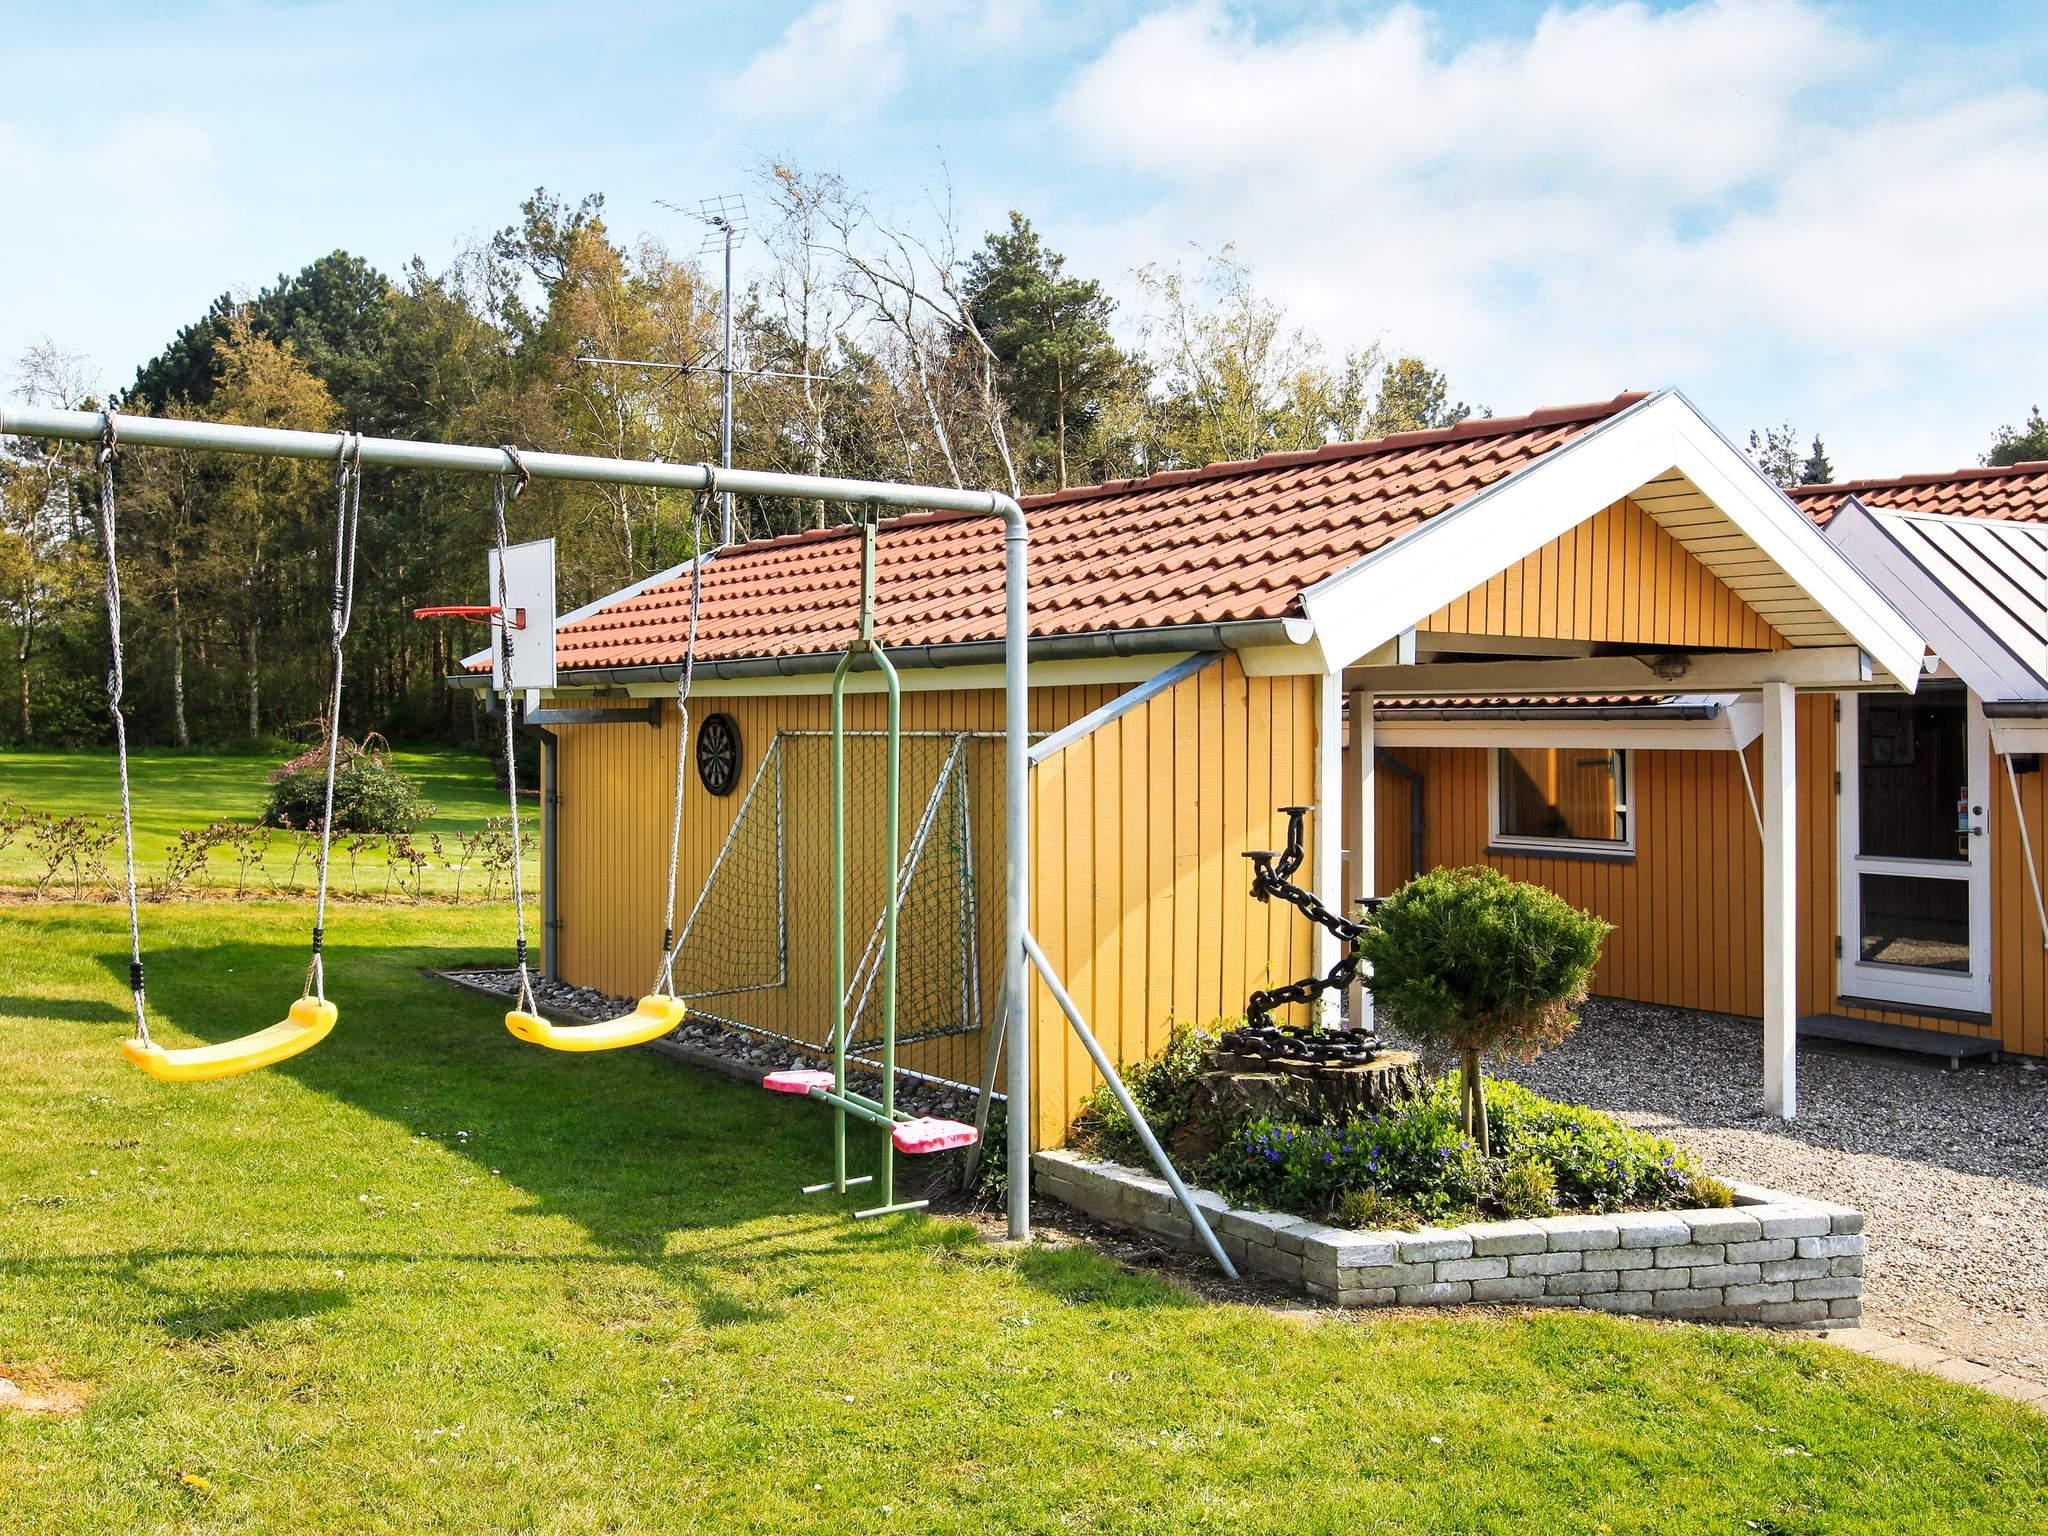 Maison de vacances Falsled (87545), Faldsled, , Fionie, Danemark, image 28